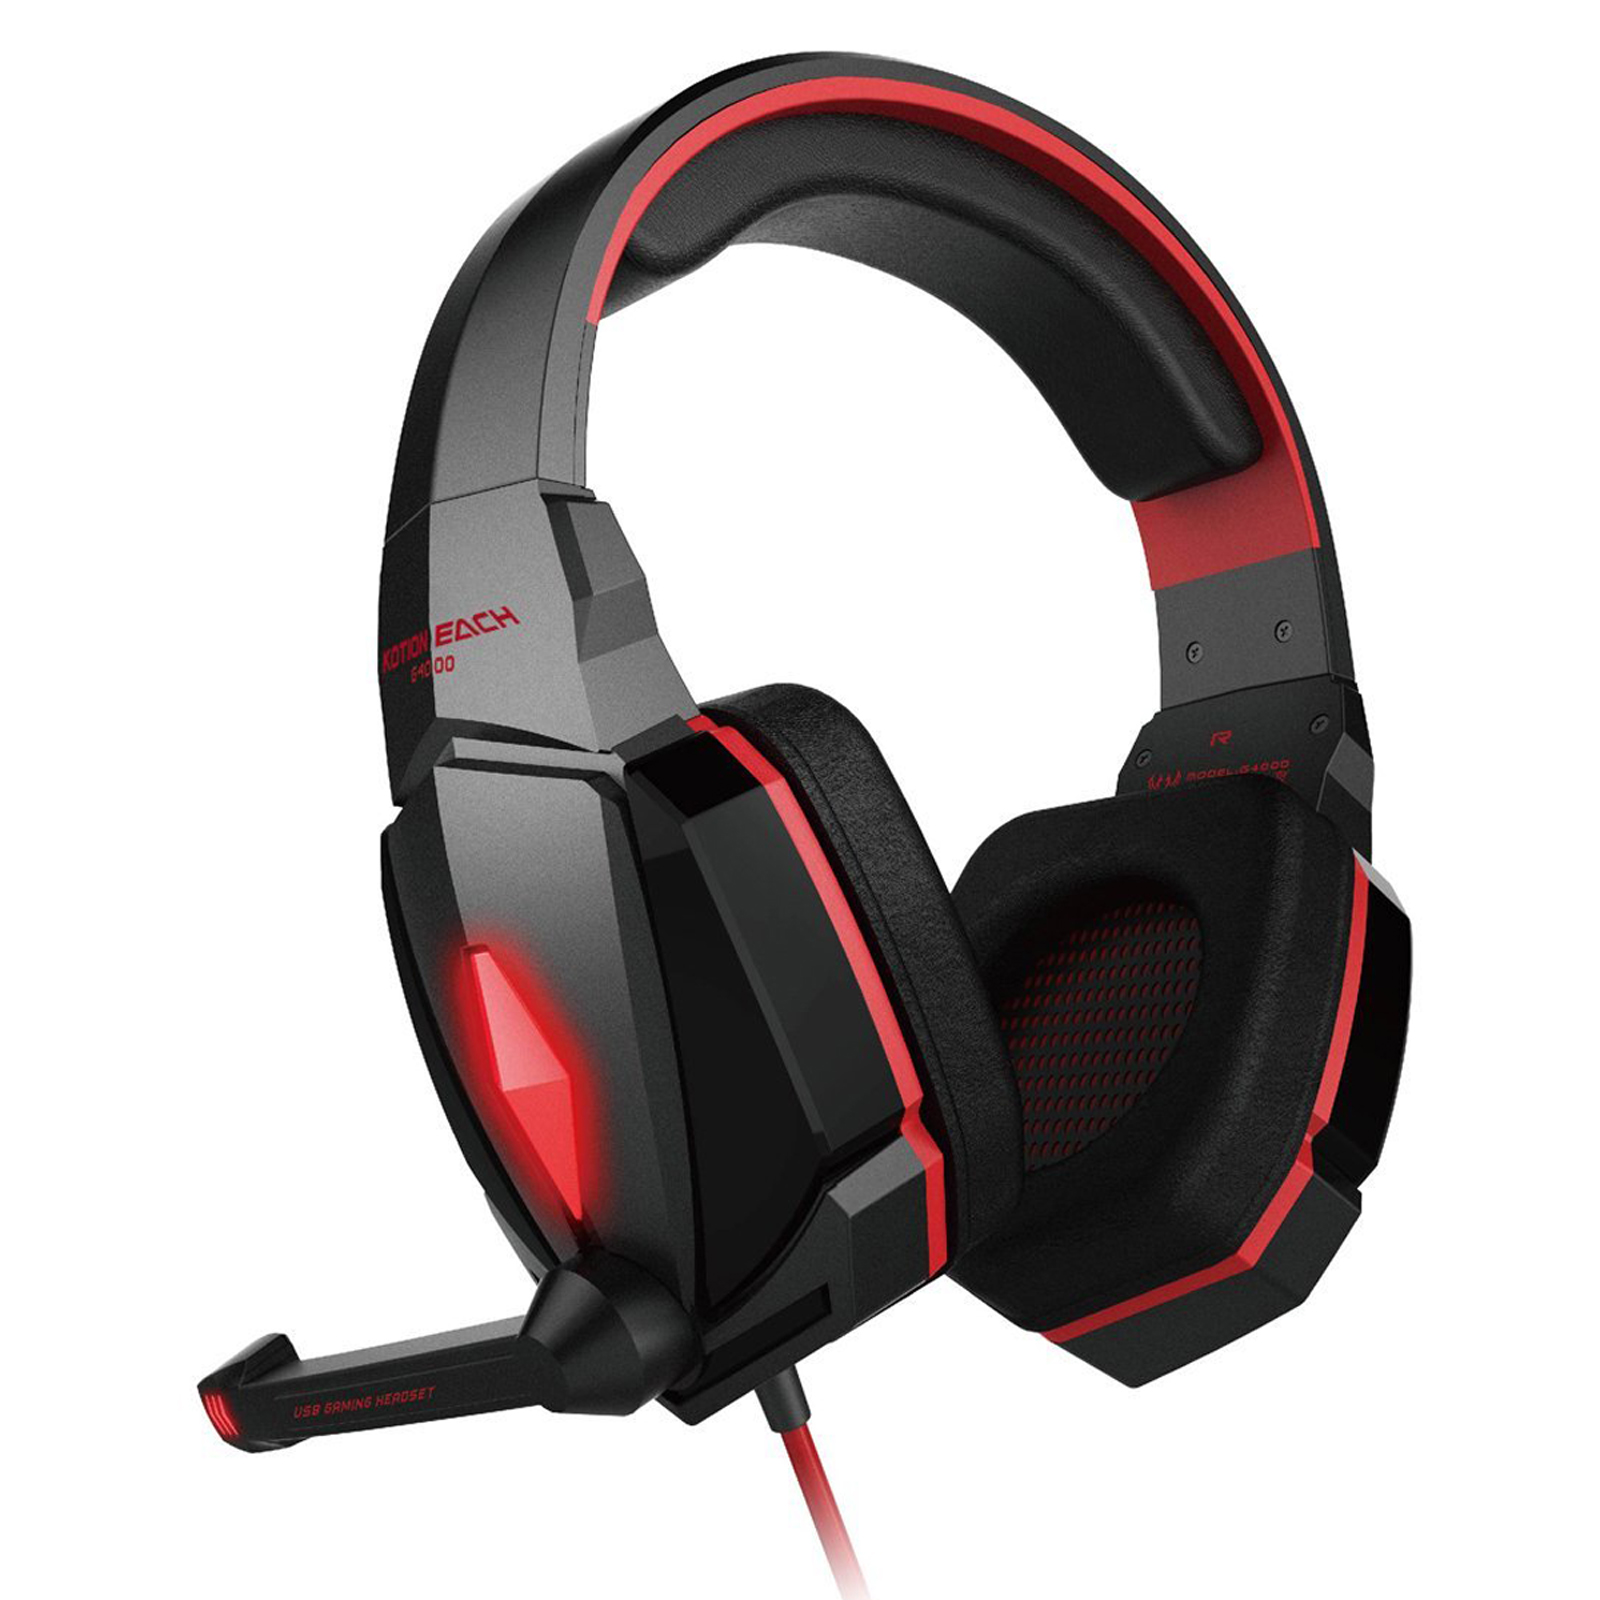 Harga Jual Headset Plus Microphone Best Quality 35mm Advance Mu8 Mic Each G4000 Gaming Stereo Headphones Headband